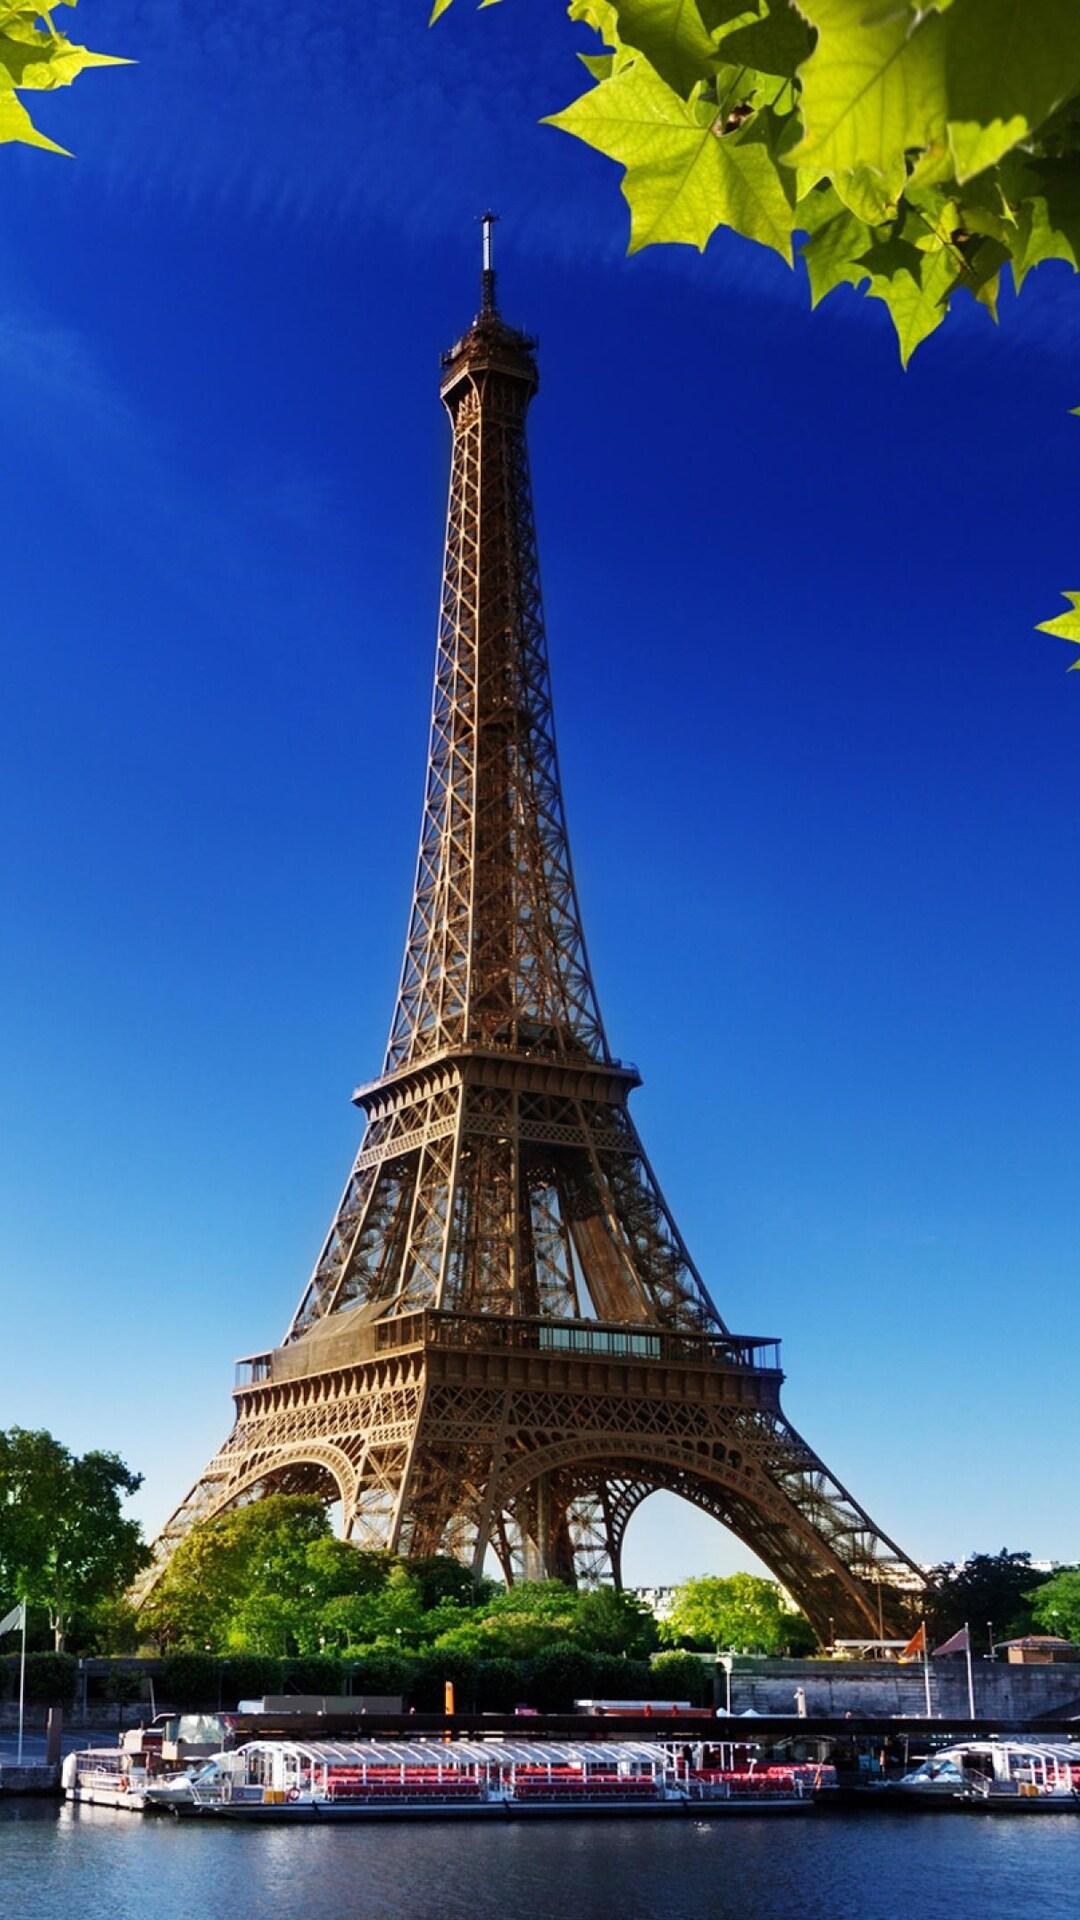 Iphone X Funny Wallpaper 1080x1920 Eiffel Tower Paris 4k Iphone 7 6s 6 Plus Pixel